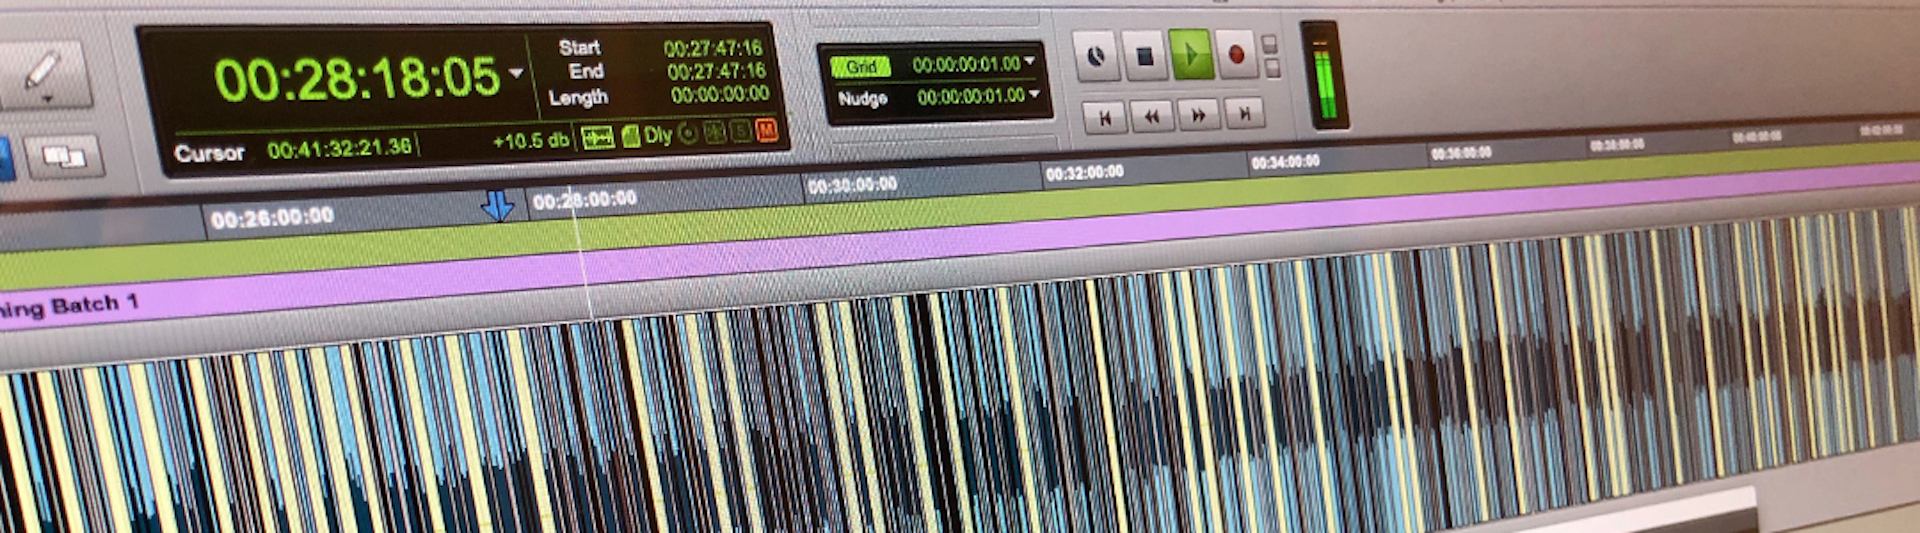 ProTools e-learning recording editing software